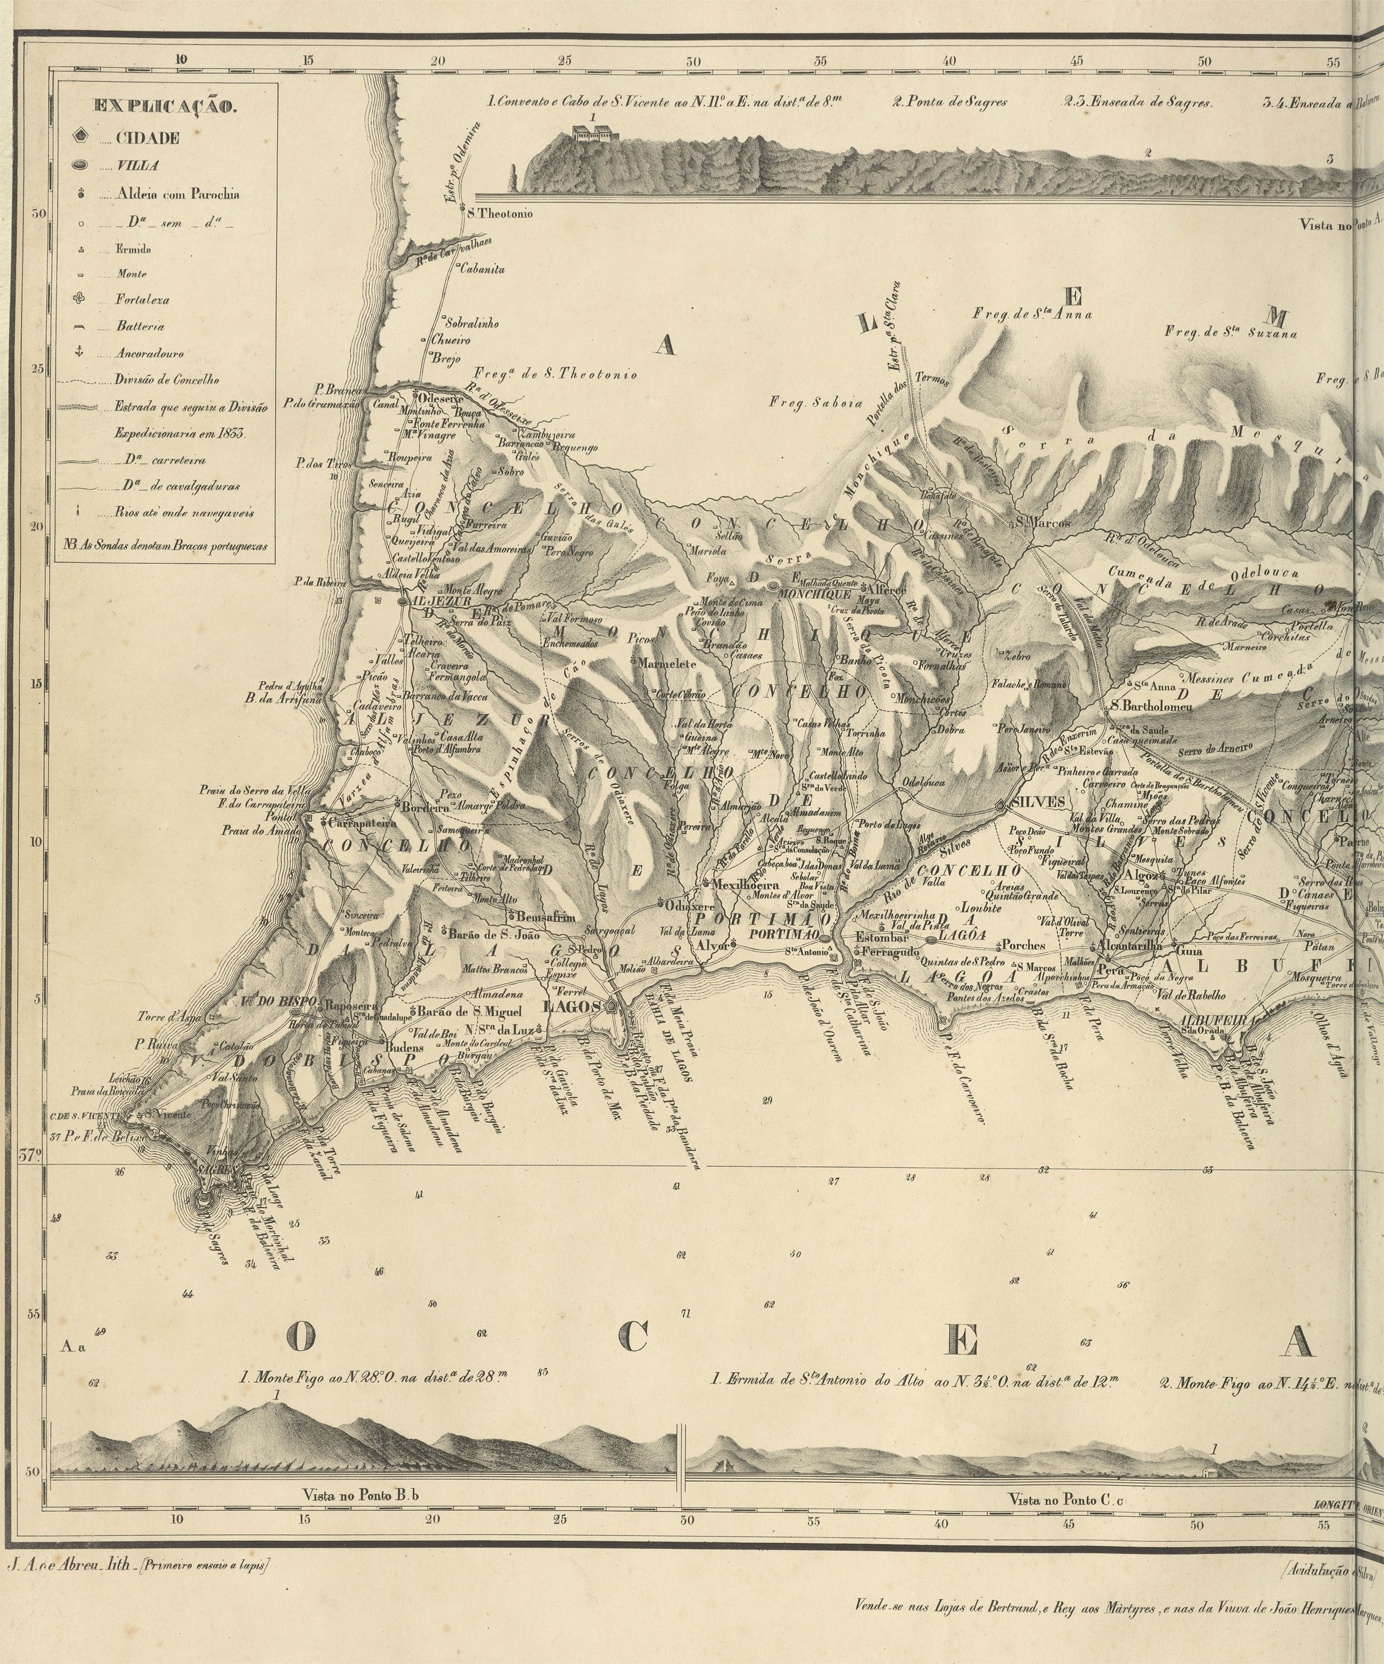 rcgt_horst_fig.6_carta_corografica_do_reino_do_algarve_lisbon_1842_nachl._f._kunstmann_c.7